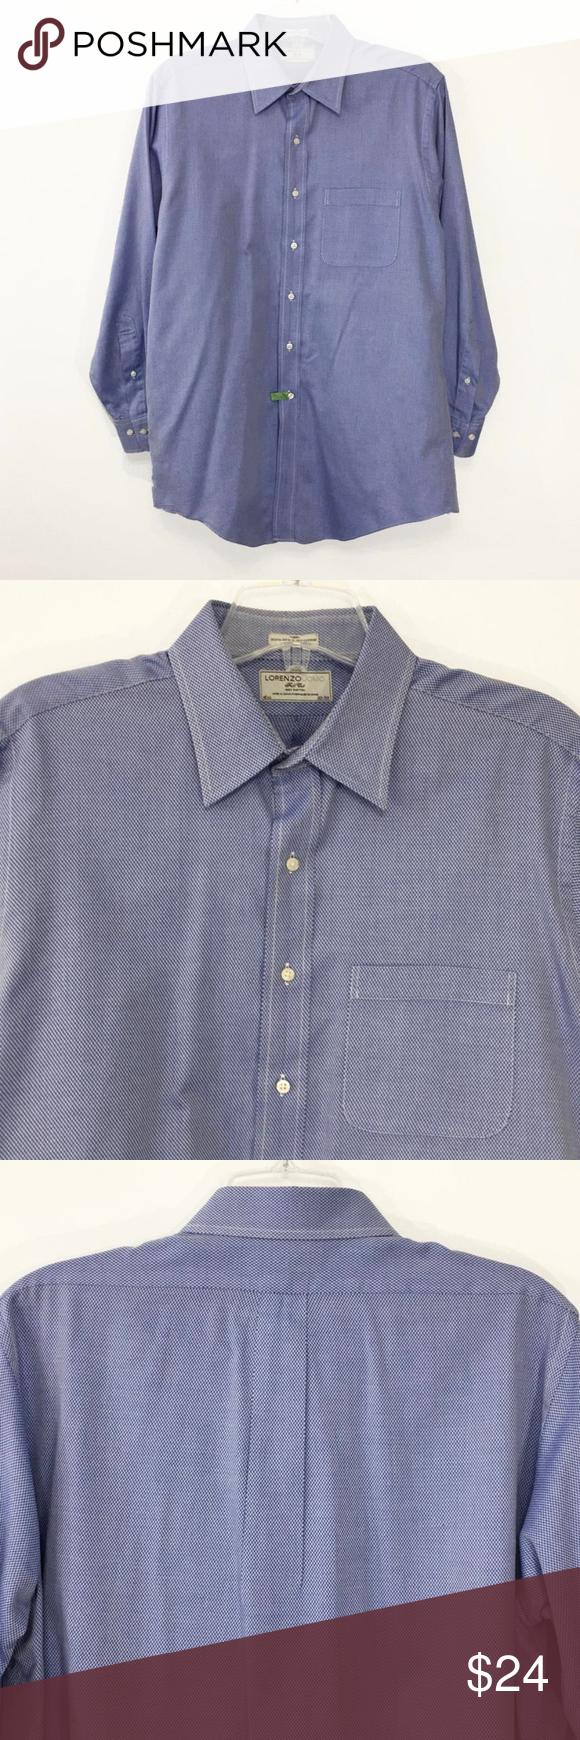 Lorenzo uomo button down long sleeve dress shirt in reseller